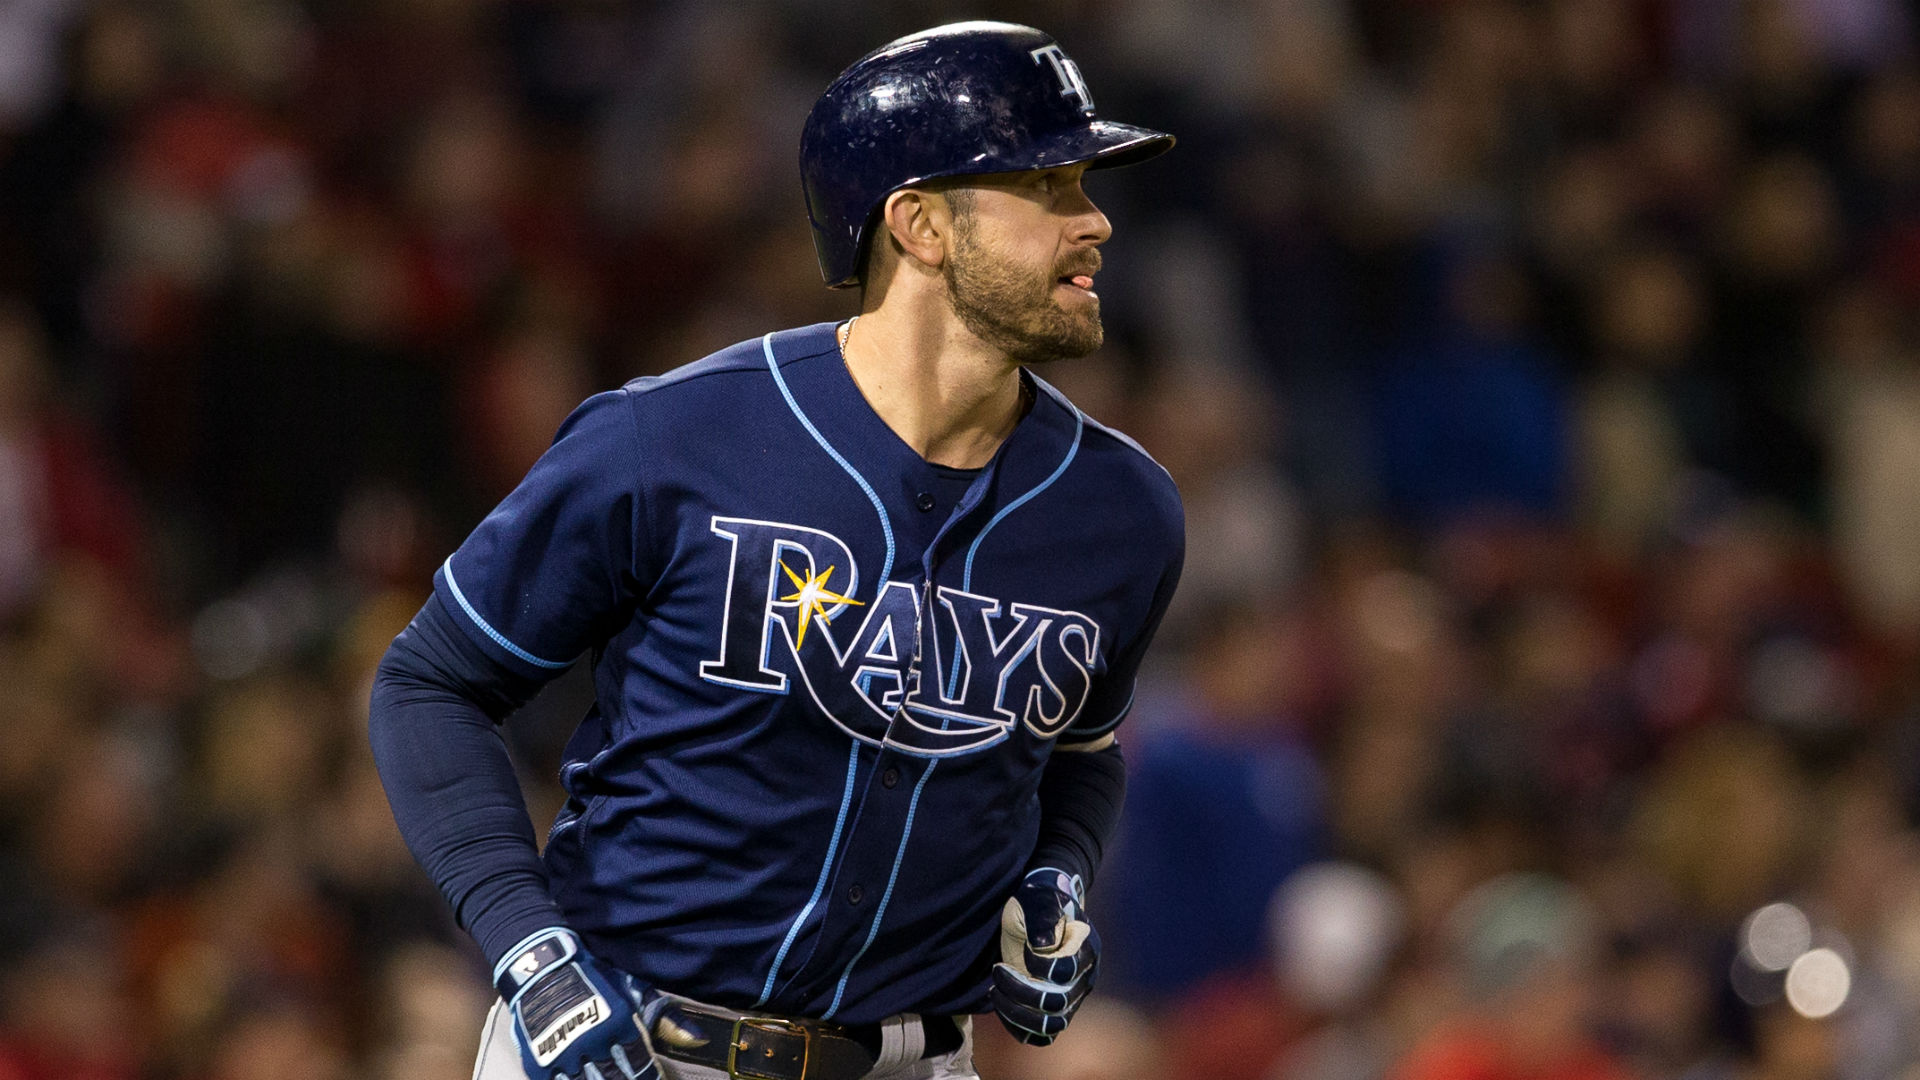 MLB trade rumors: Cardinals-Rays talks could grow to include 3B Evan Longoria